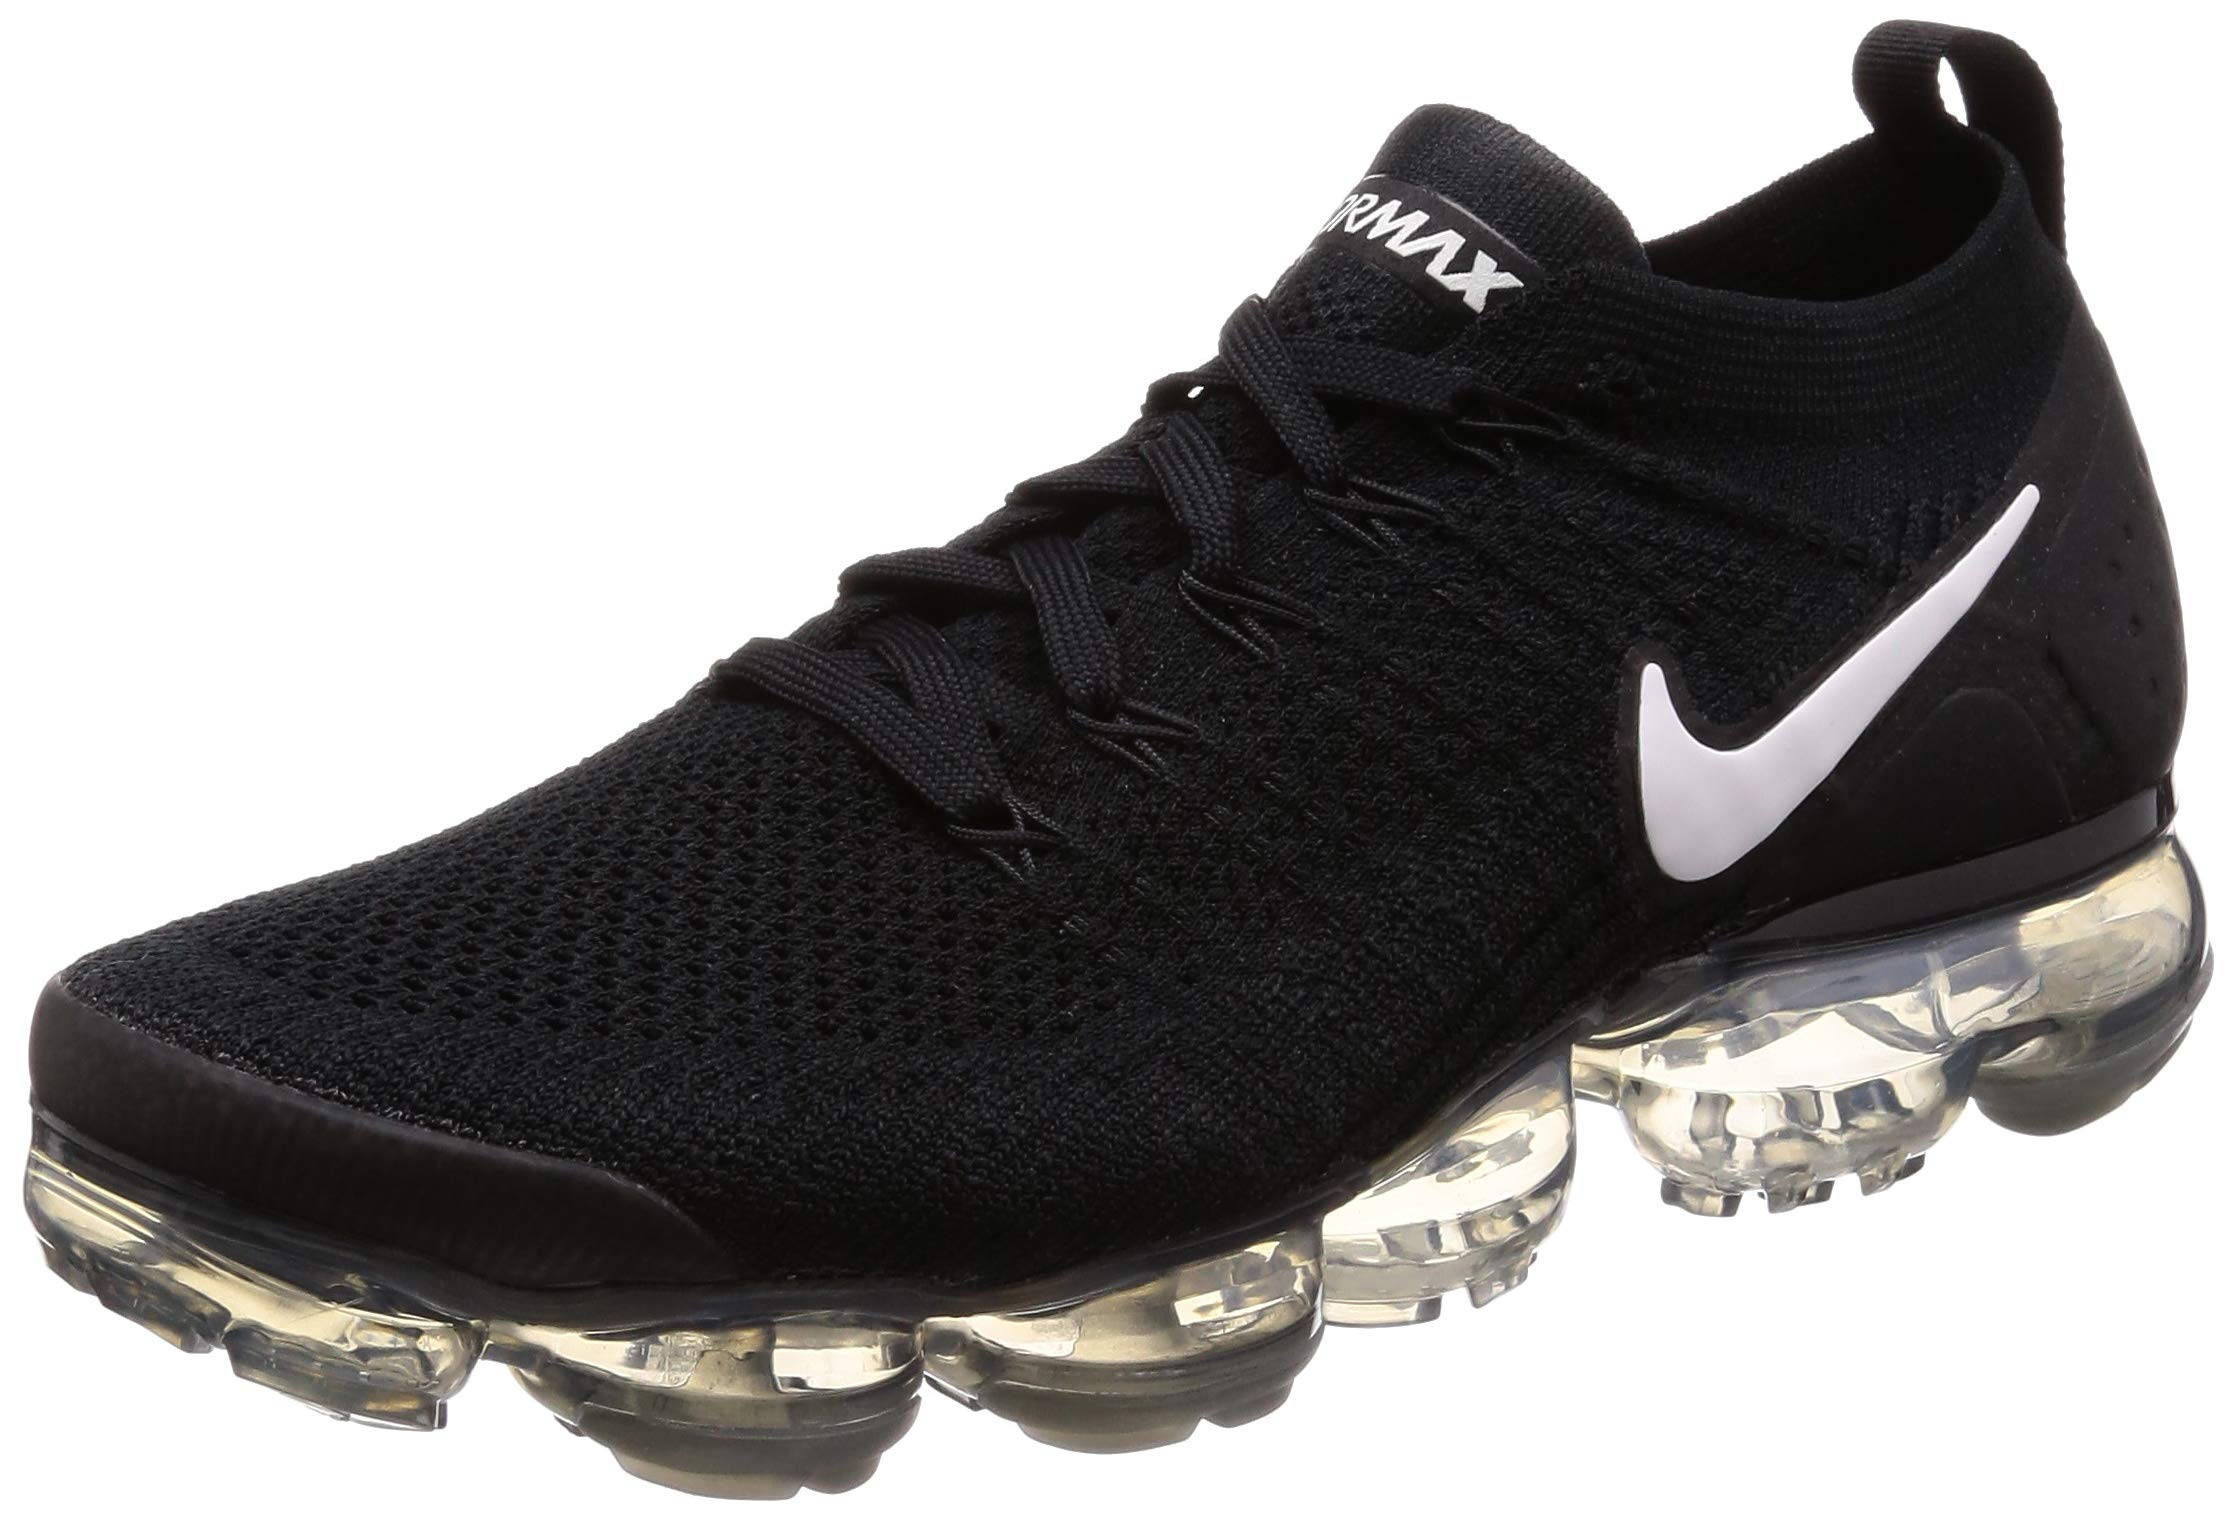 71OMeCK5buL - Nike Men's Air Vapormax Flyknit 2 Low-Top Sneakers